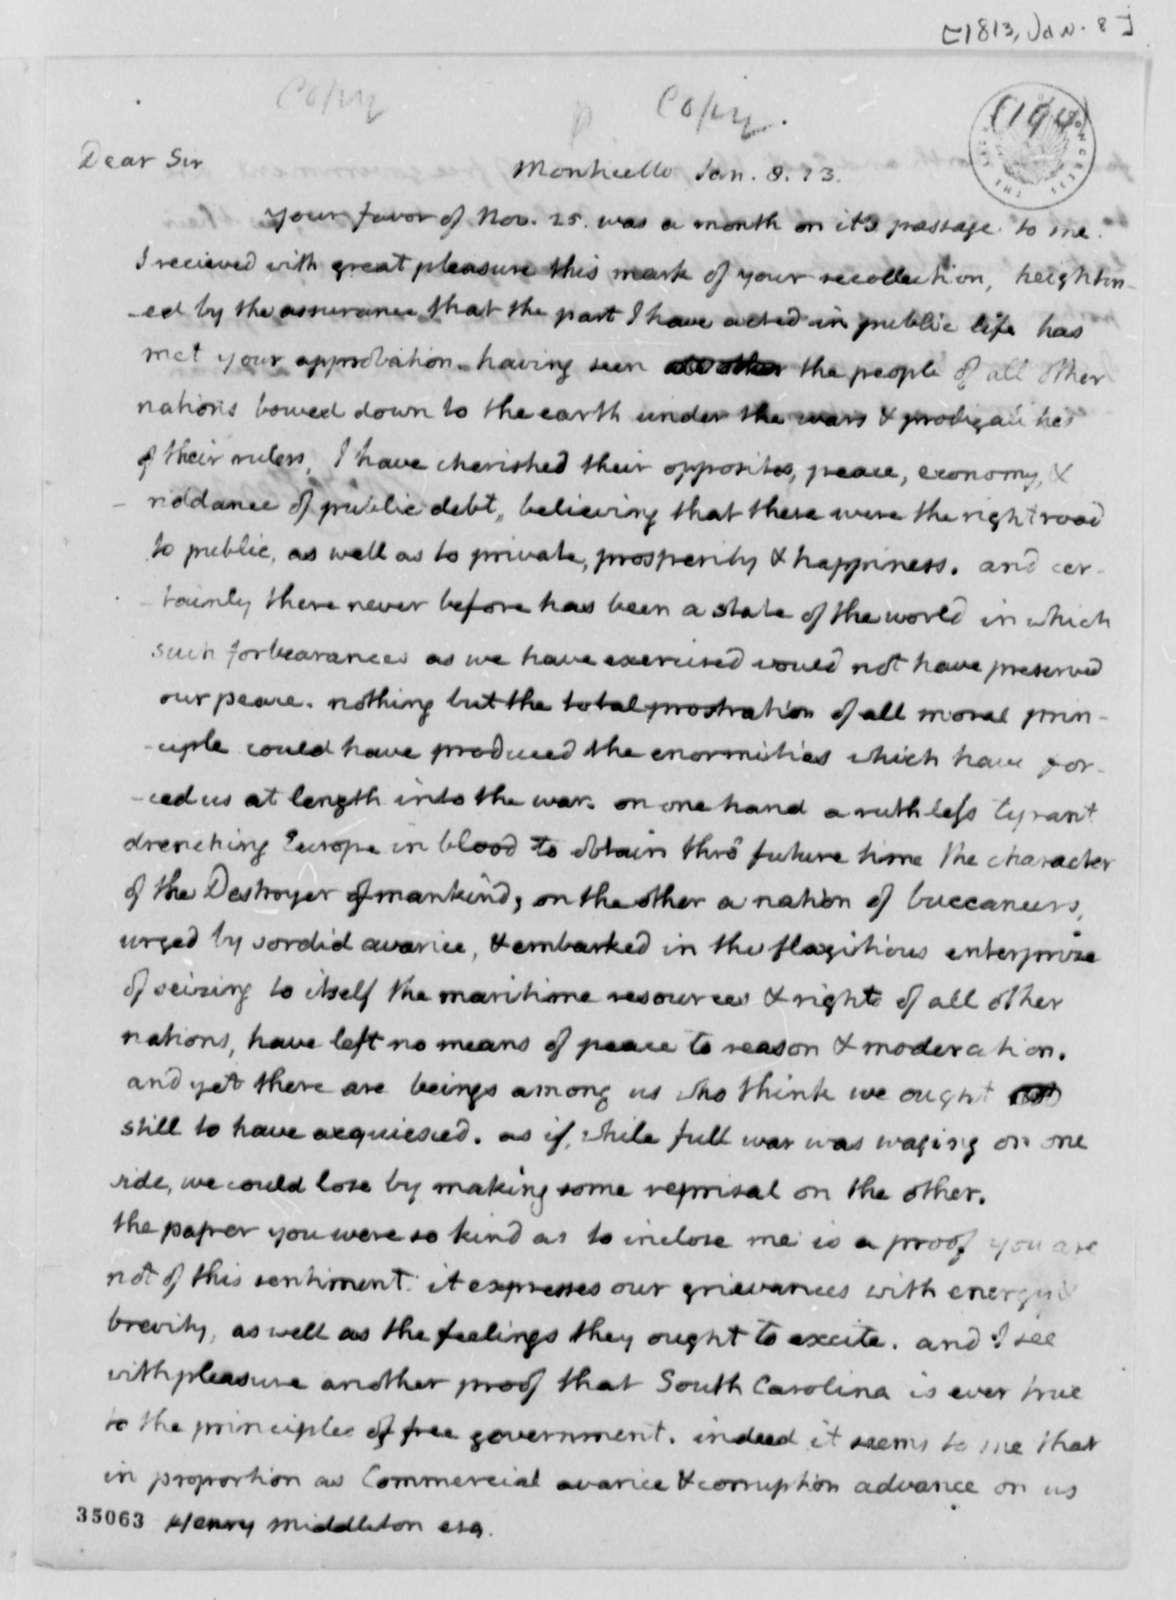 Thomas Jefferson to Henry Middleton, January 8, 1813